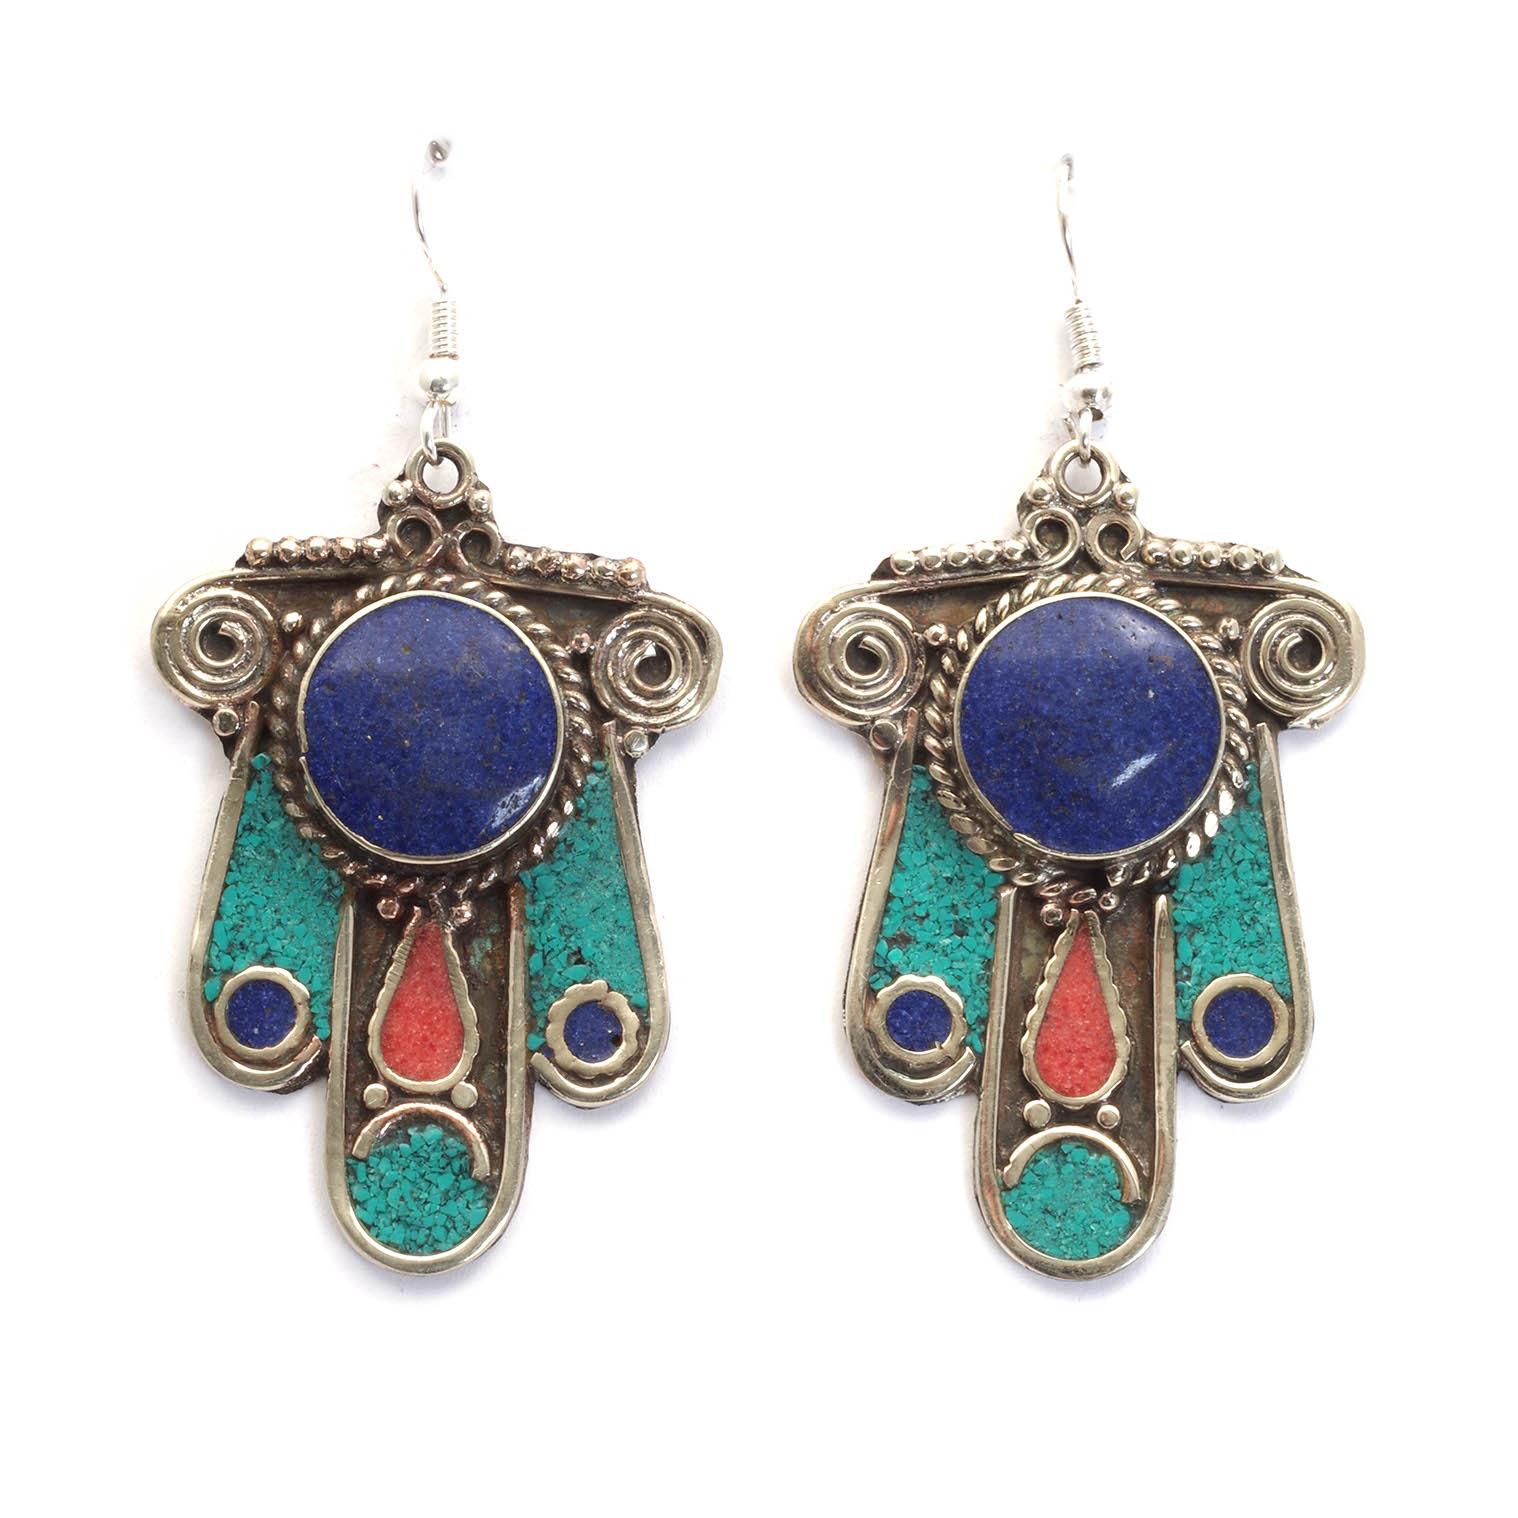 Elaborate Fatima Metal Earrings